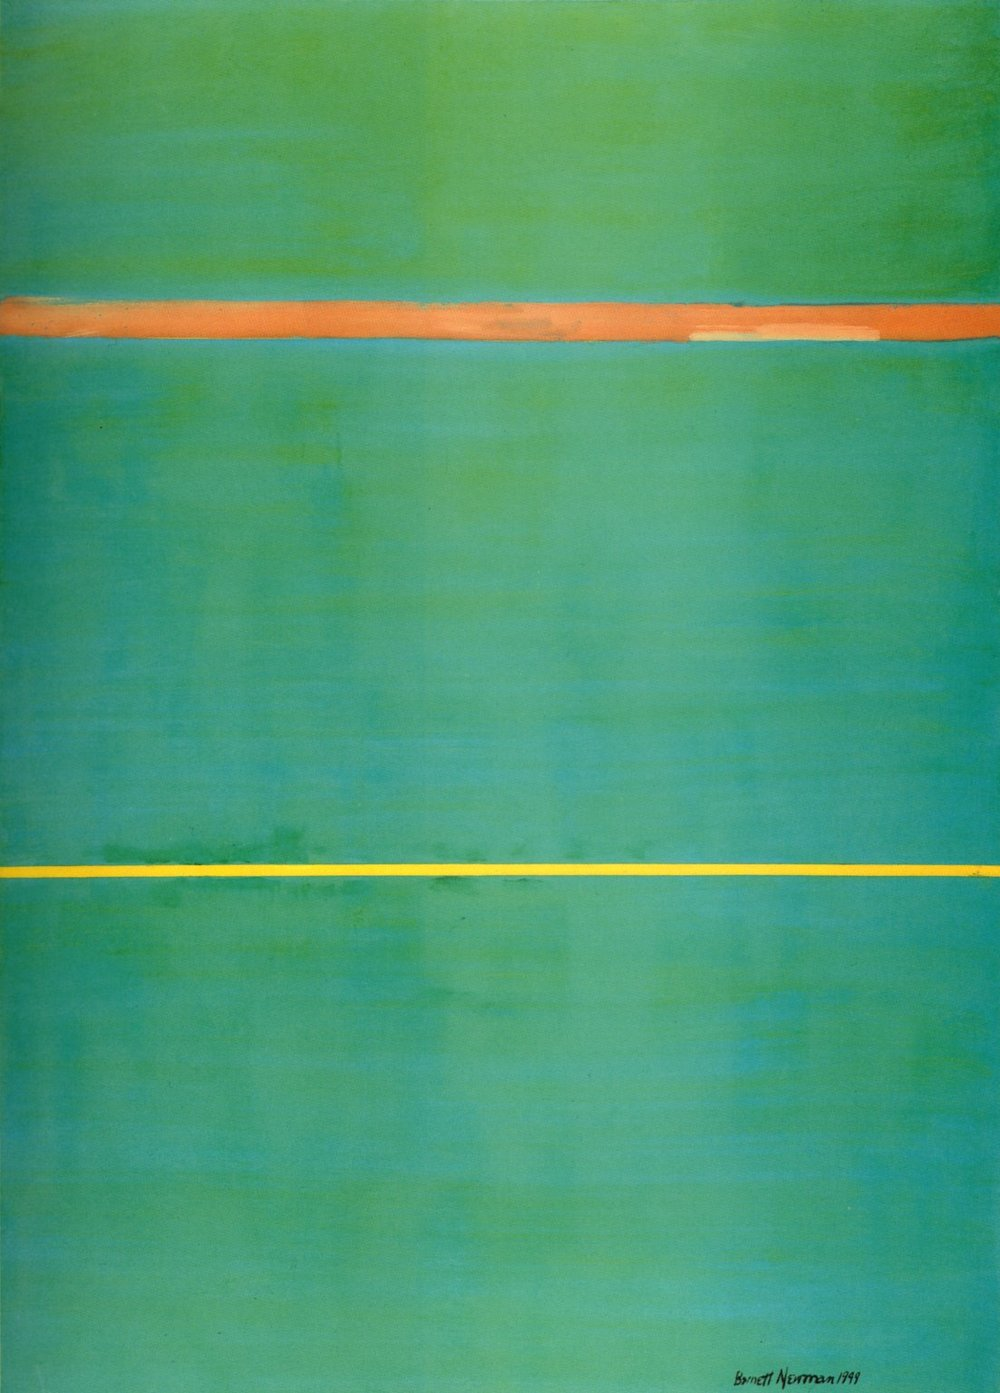 Barnett Newman,  Dionysius , 1949, National Gallery of Art, Washington DC.